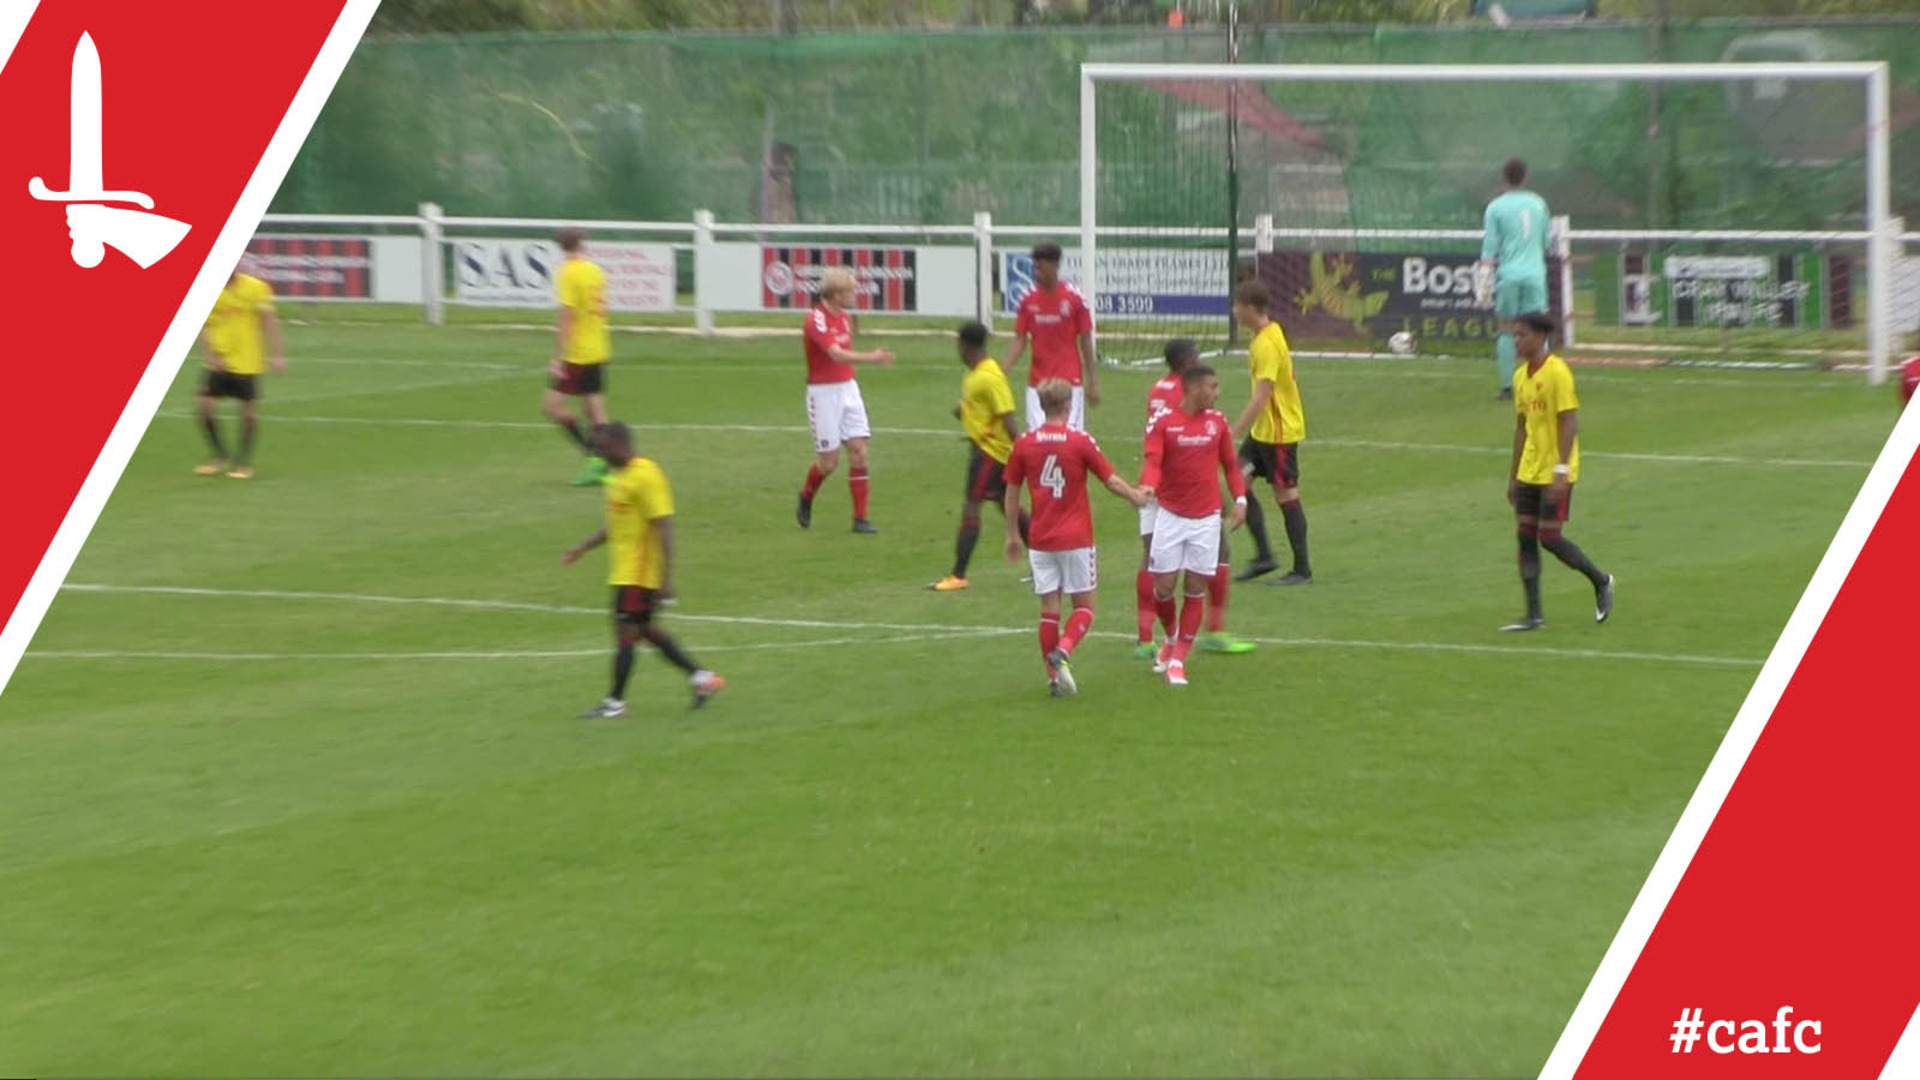 U23S HIGHLIGHTS | Charlton 2 Watford 0